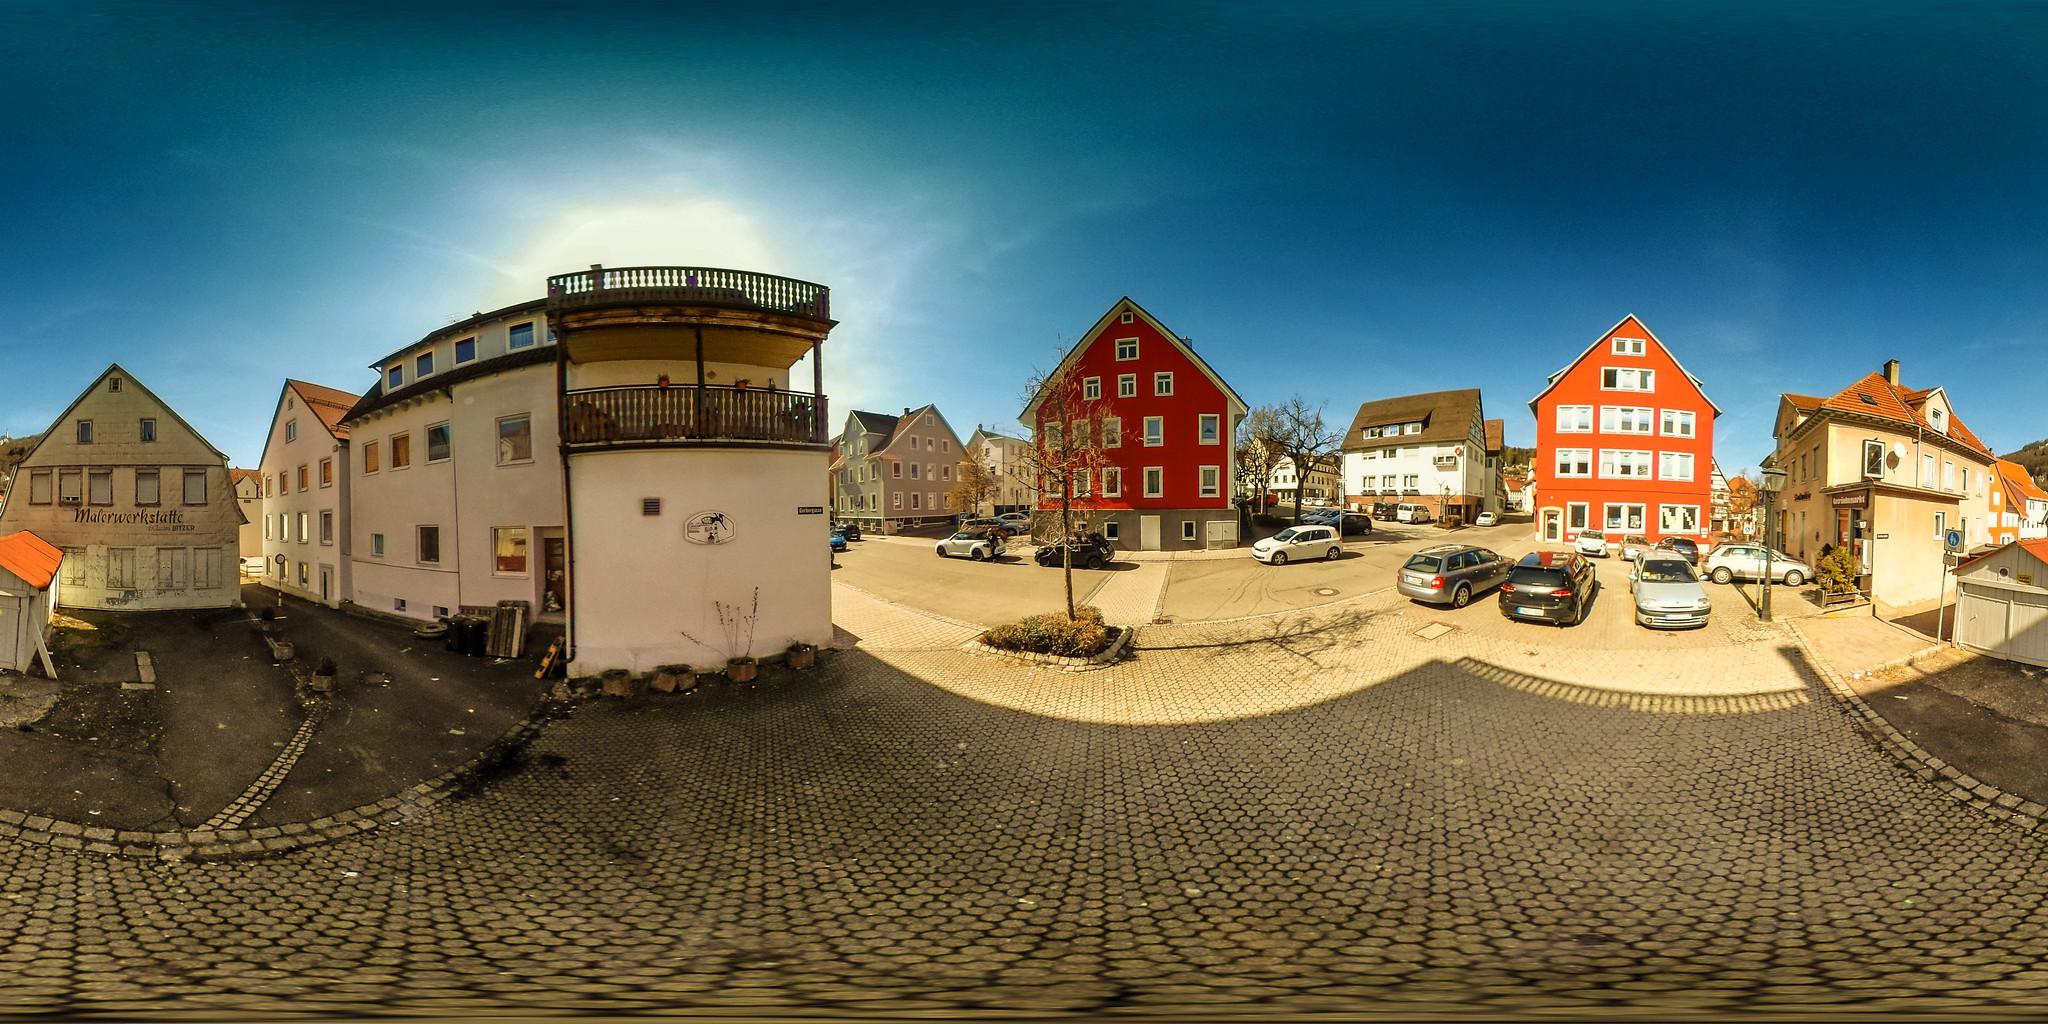 Landgraben, Ecke Gerbergasse